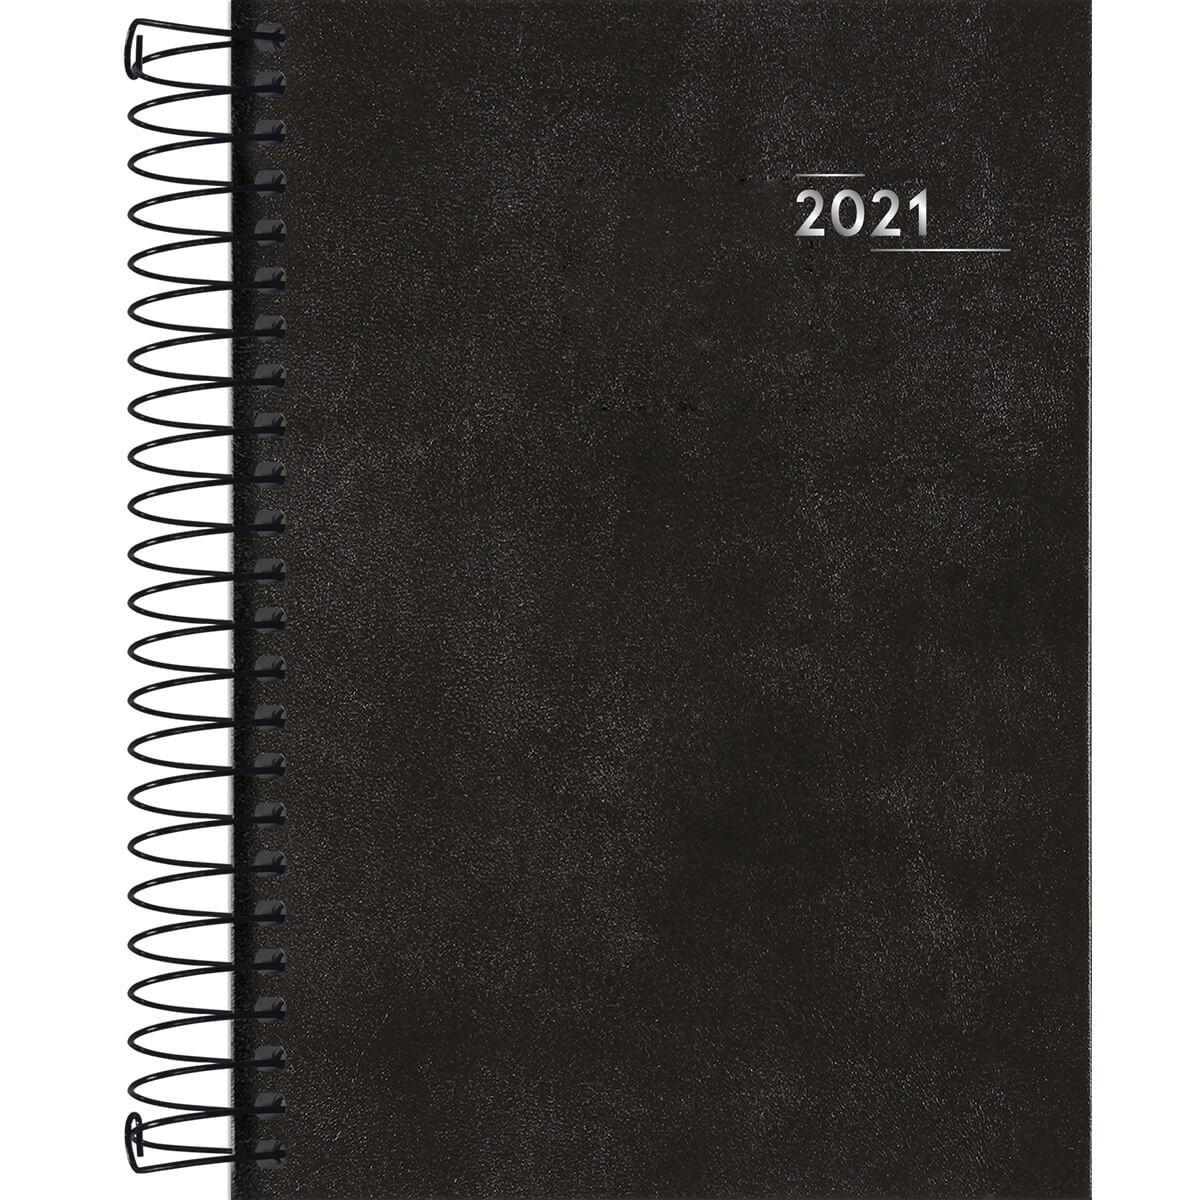 Agenda 2021 Executiva Espiral Napoli 130095 Tilibra 15140